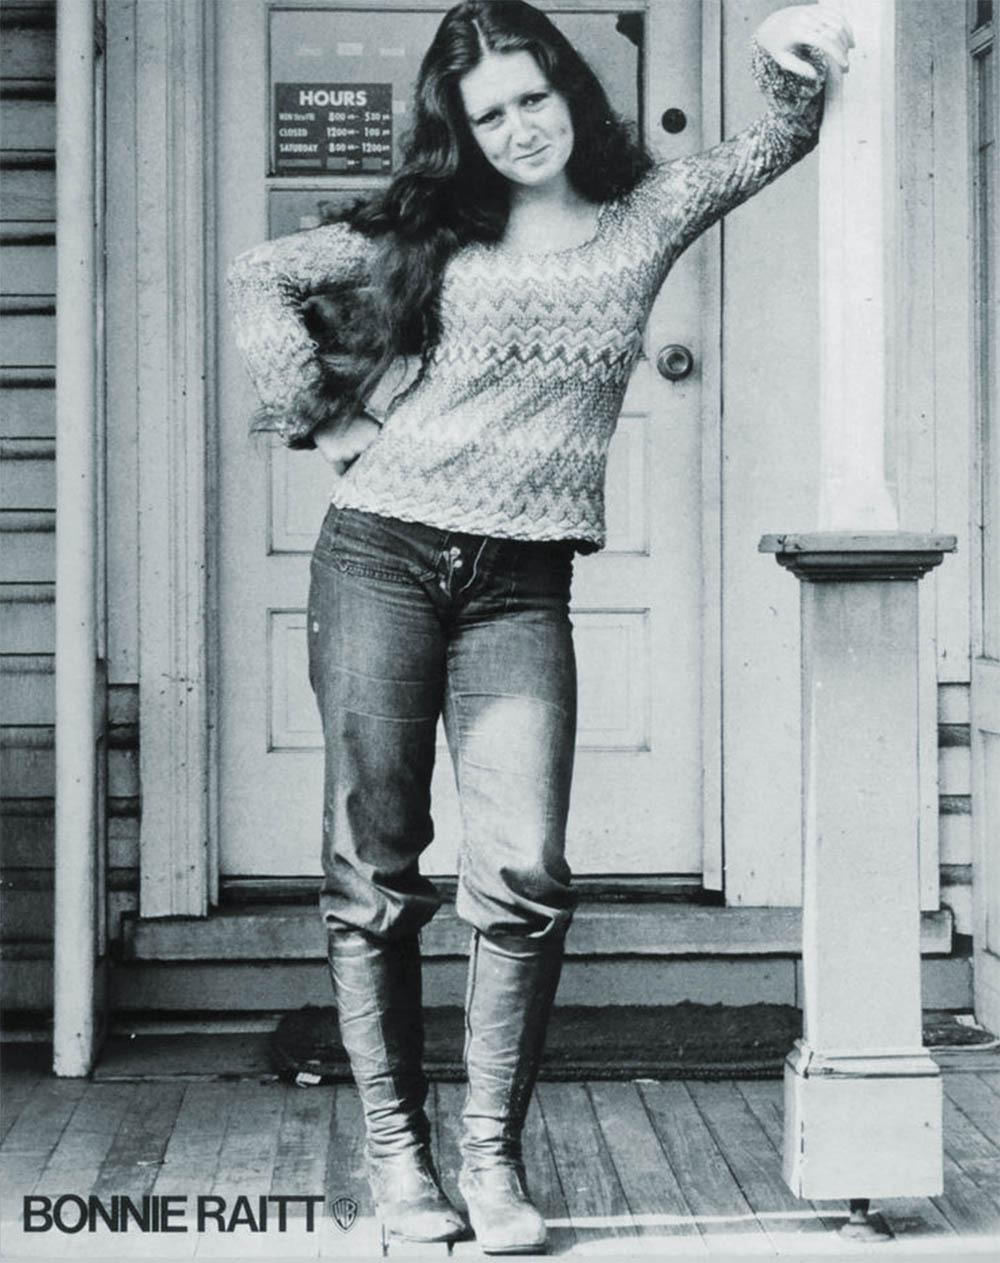 Bonnie Raitt 1971 Warner Bros Record Store Poster For Her  # Pose Tele En Boi